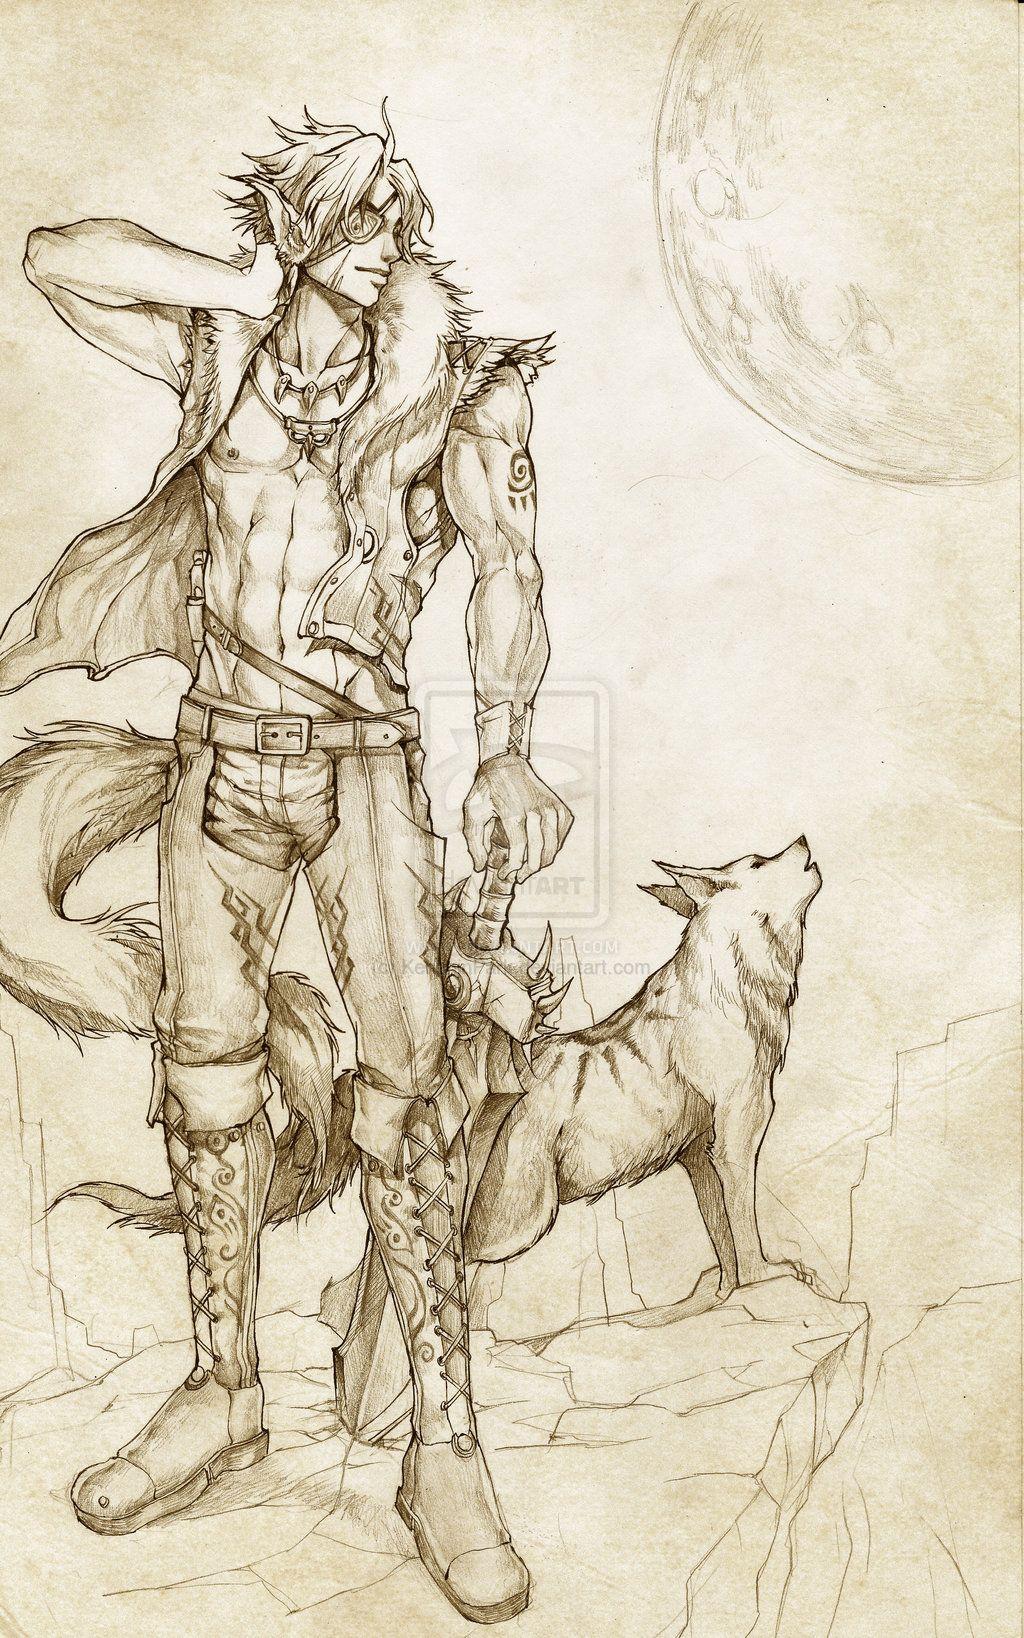 The Wolfman by KenshjnPark.deviantart.com on @deviantART | Anime ...